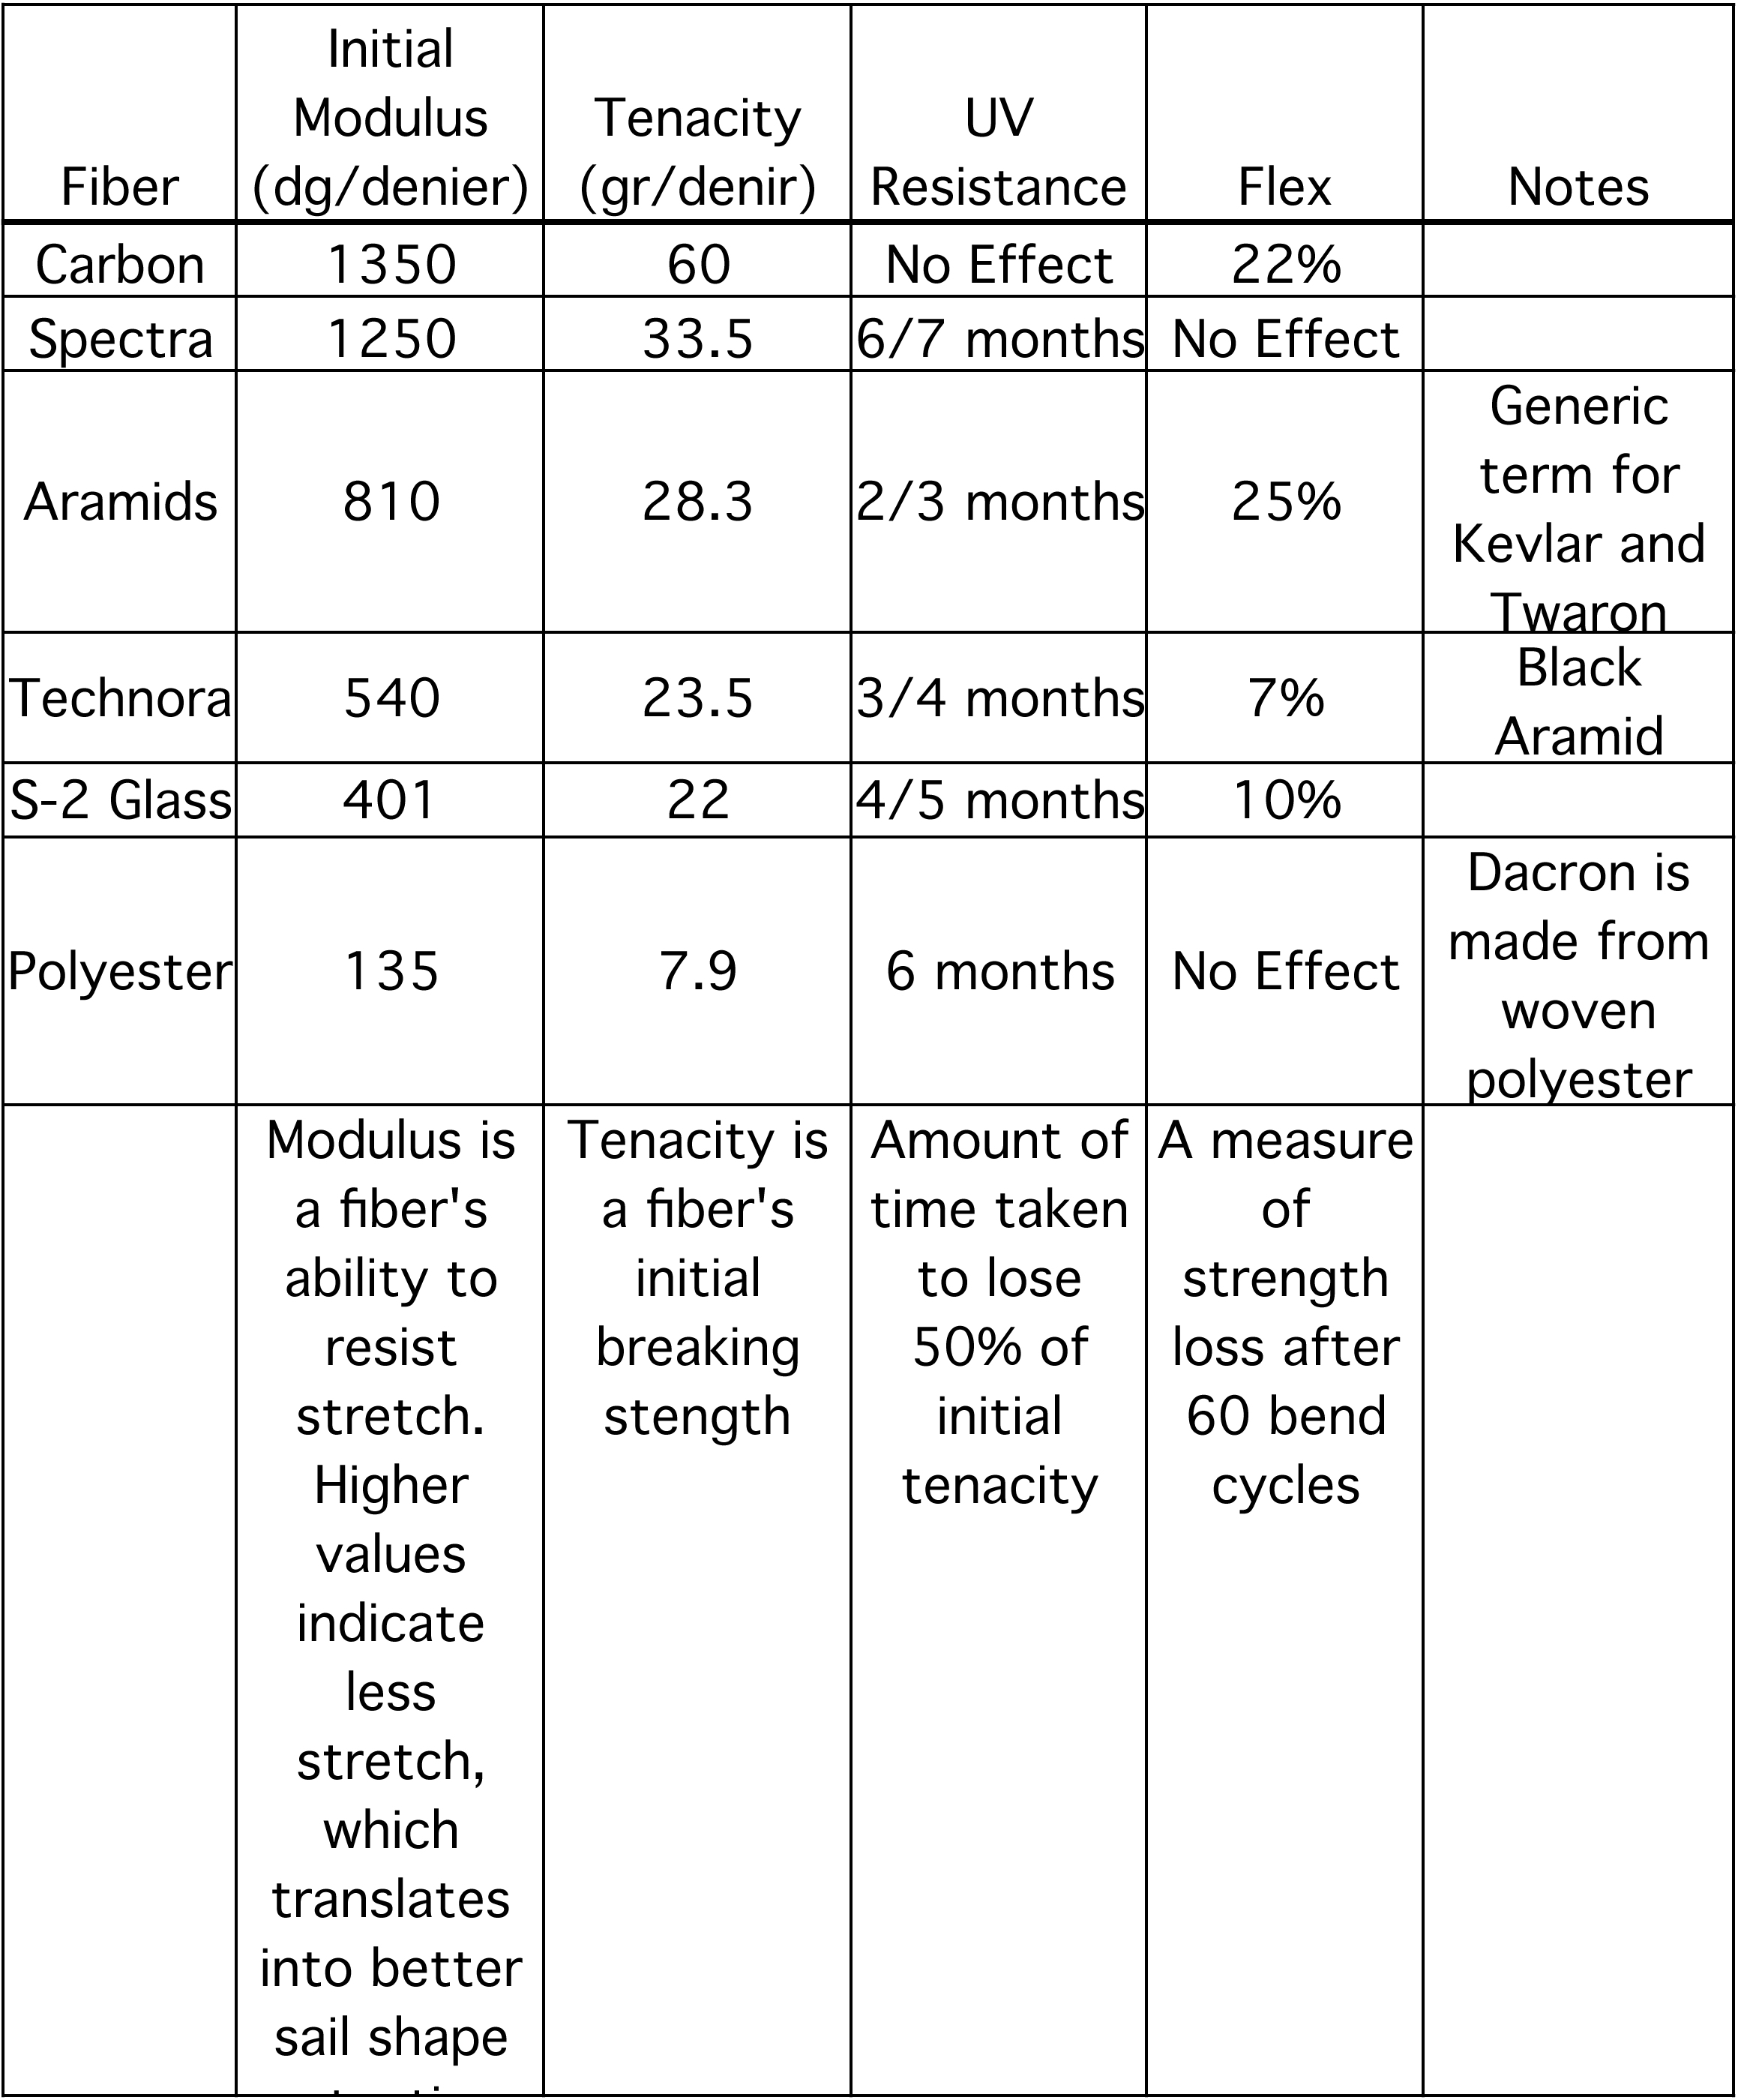 Fiber comparison chart